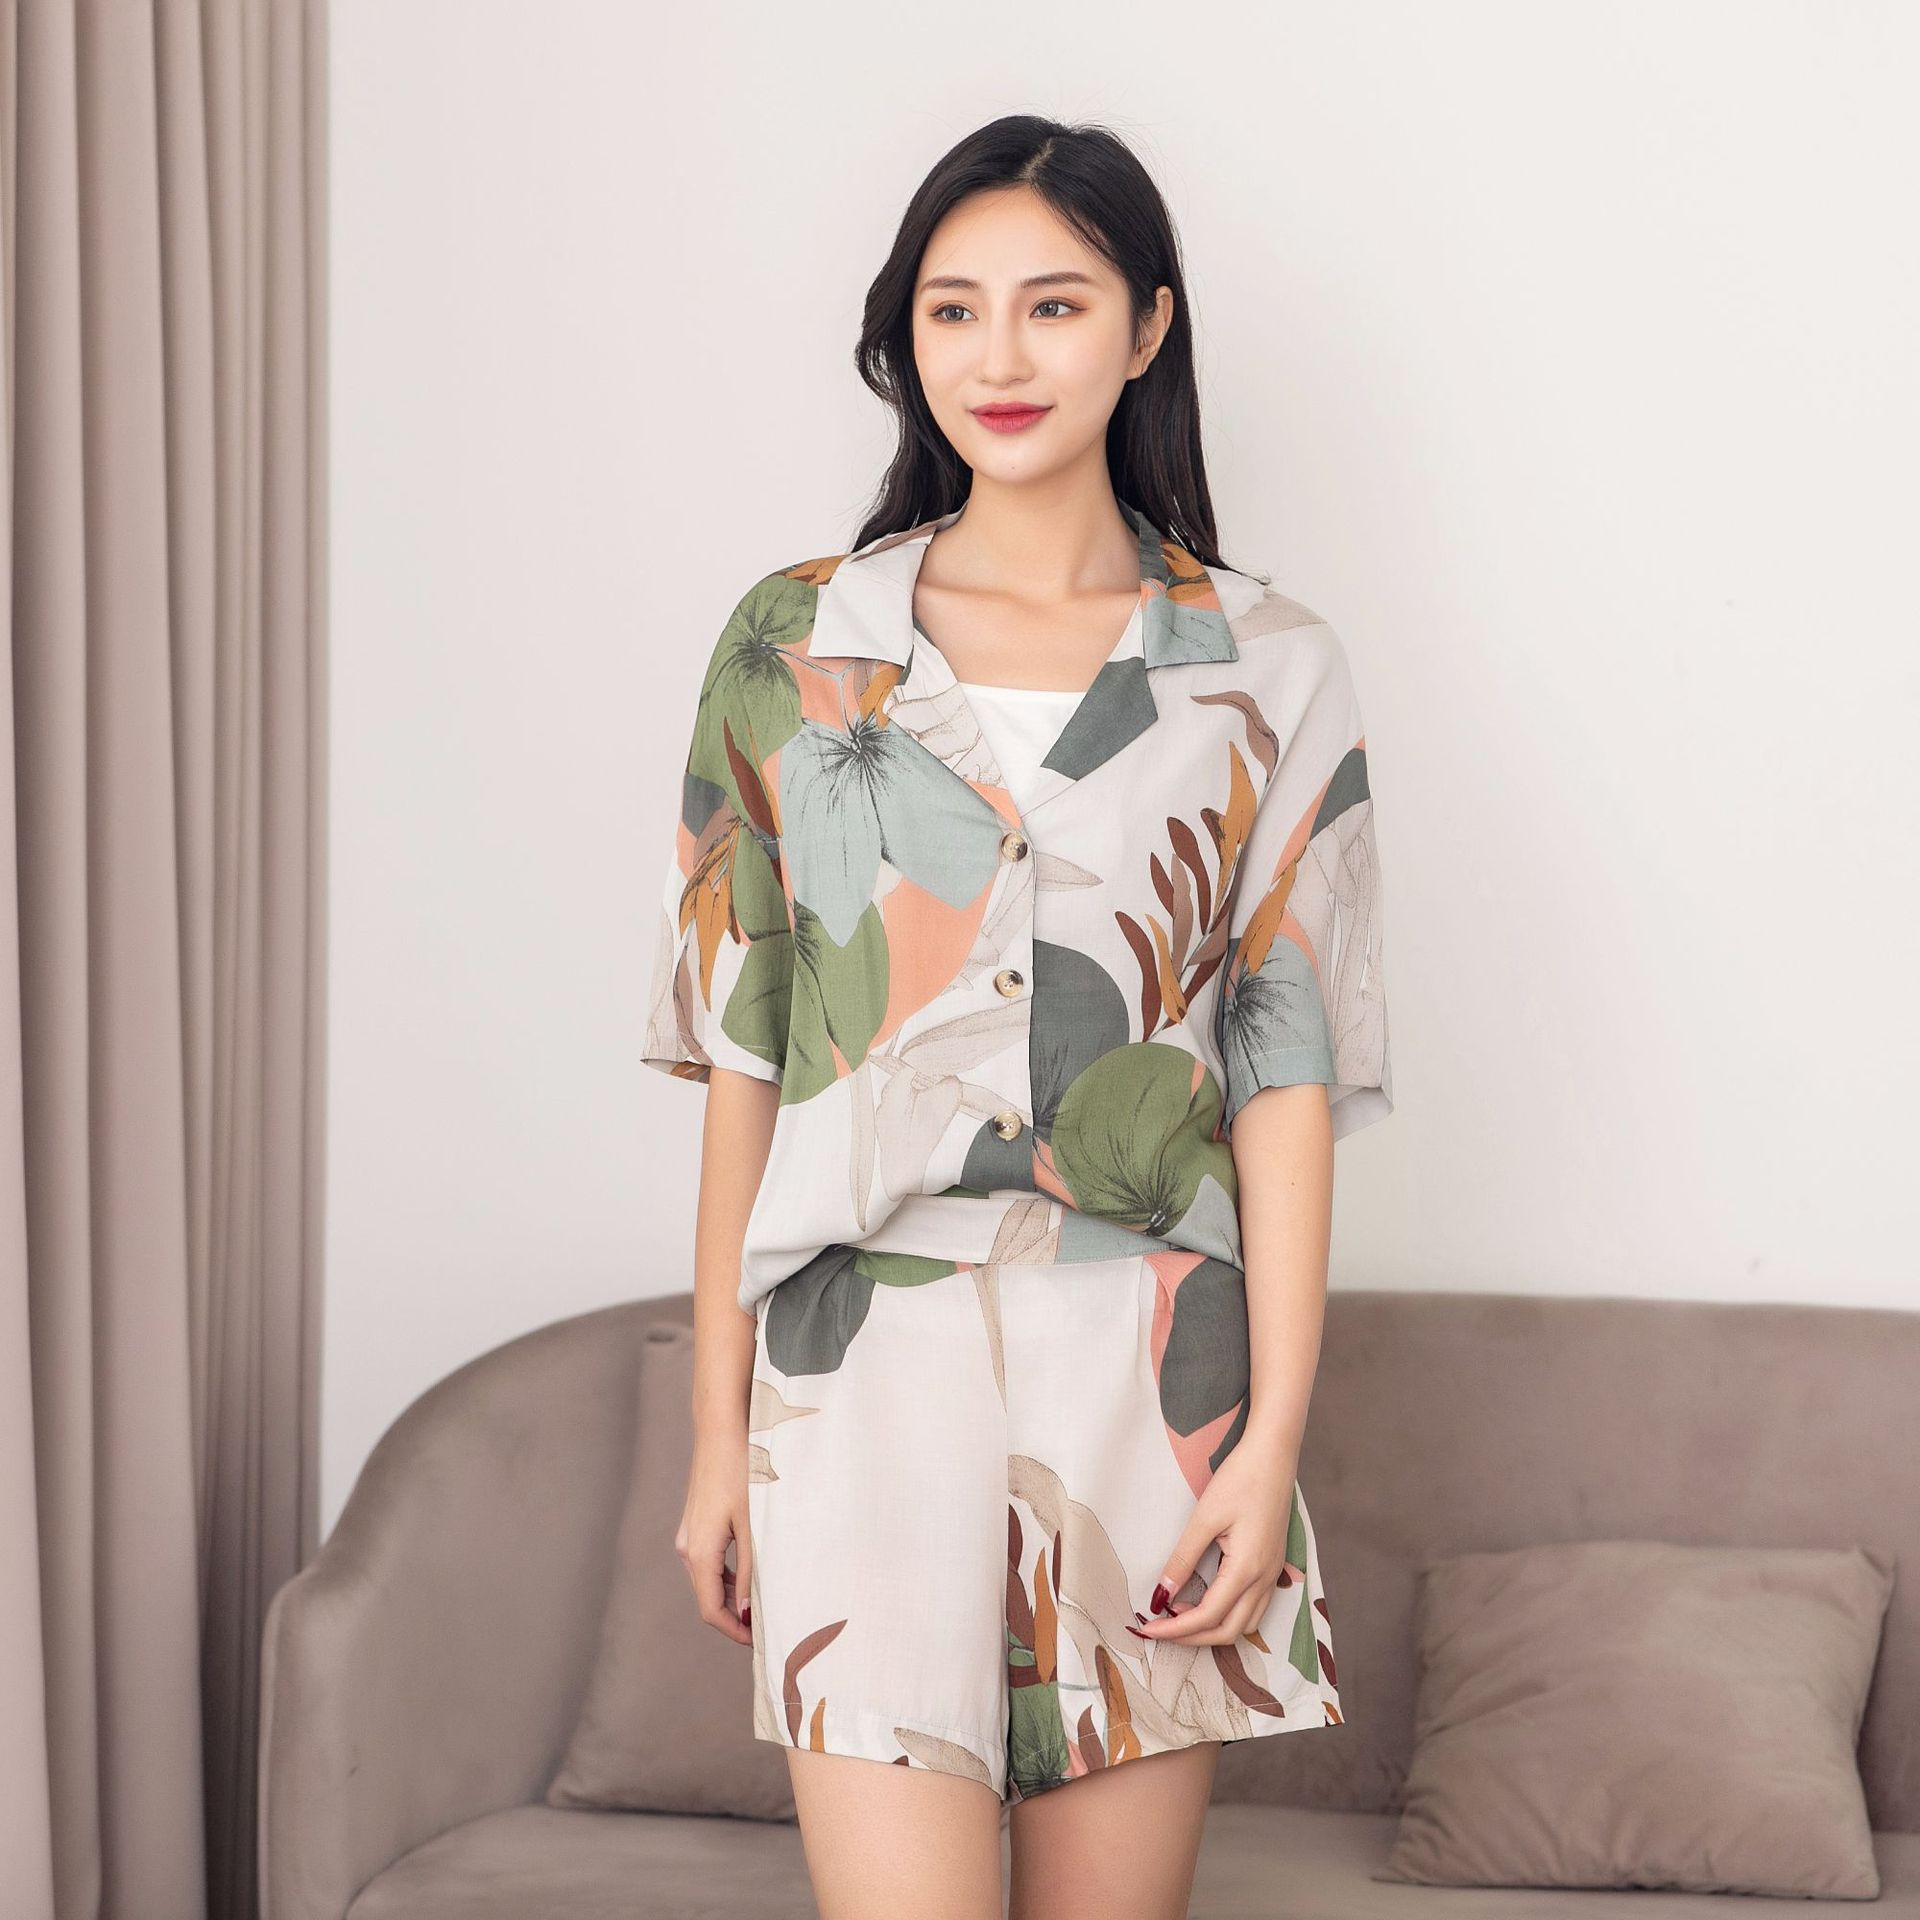 Ladies Shorts Pajamas Set For Summer Newest Leaves Printing Short Sleeve With Shorts Pajamas Cardigan Lapel Women Shorts Pajamas